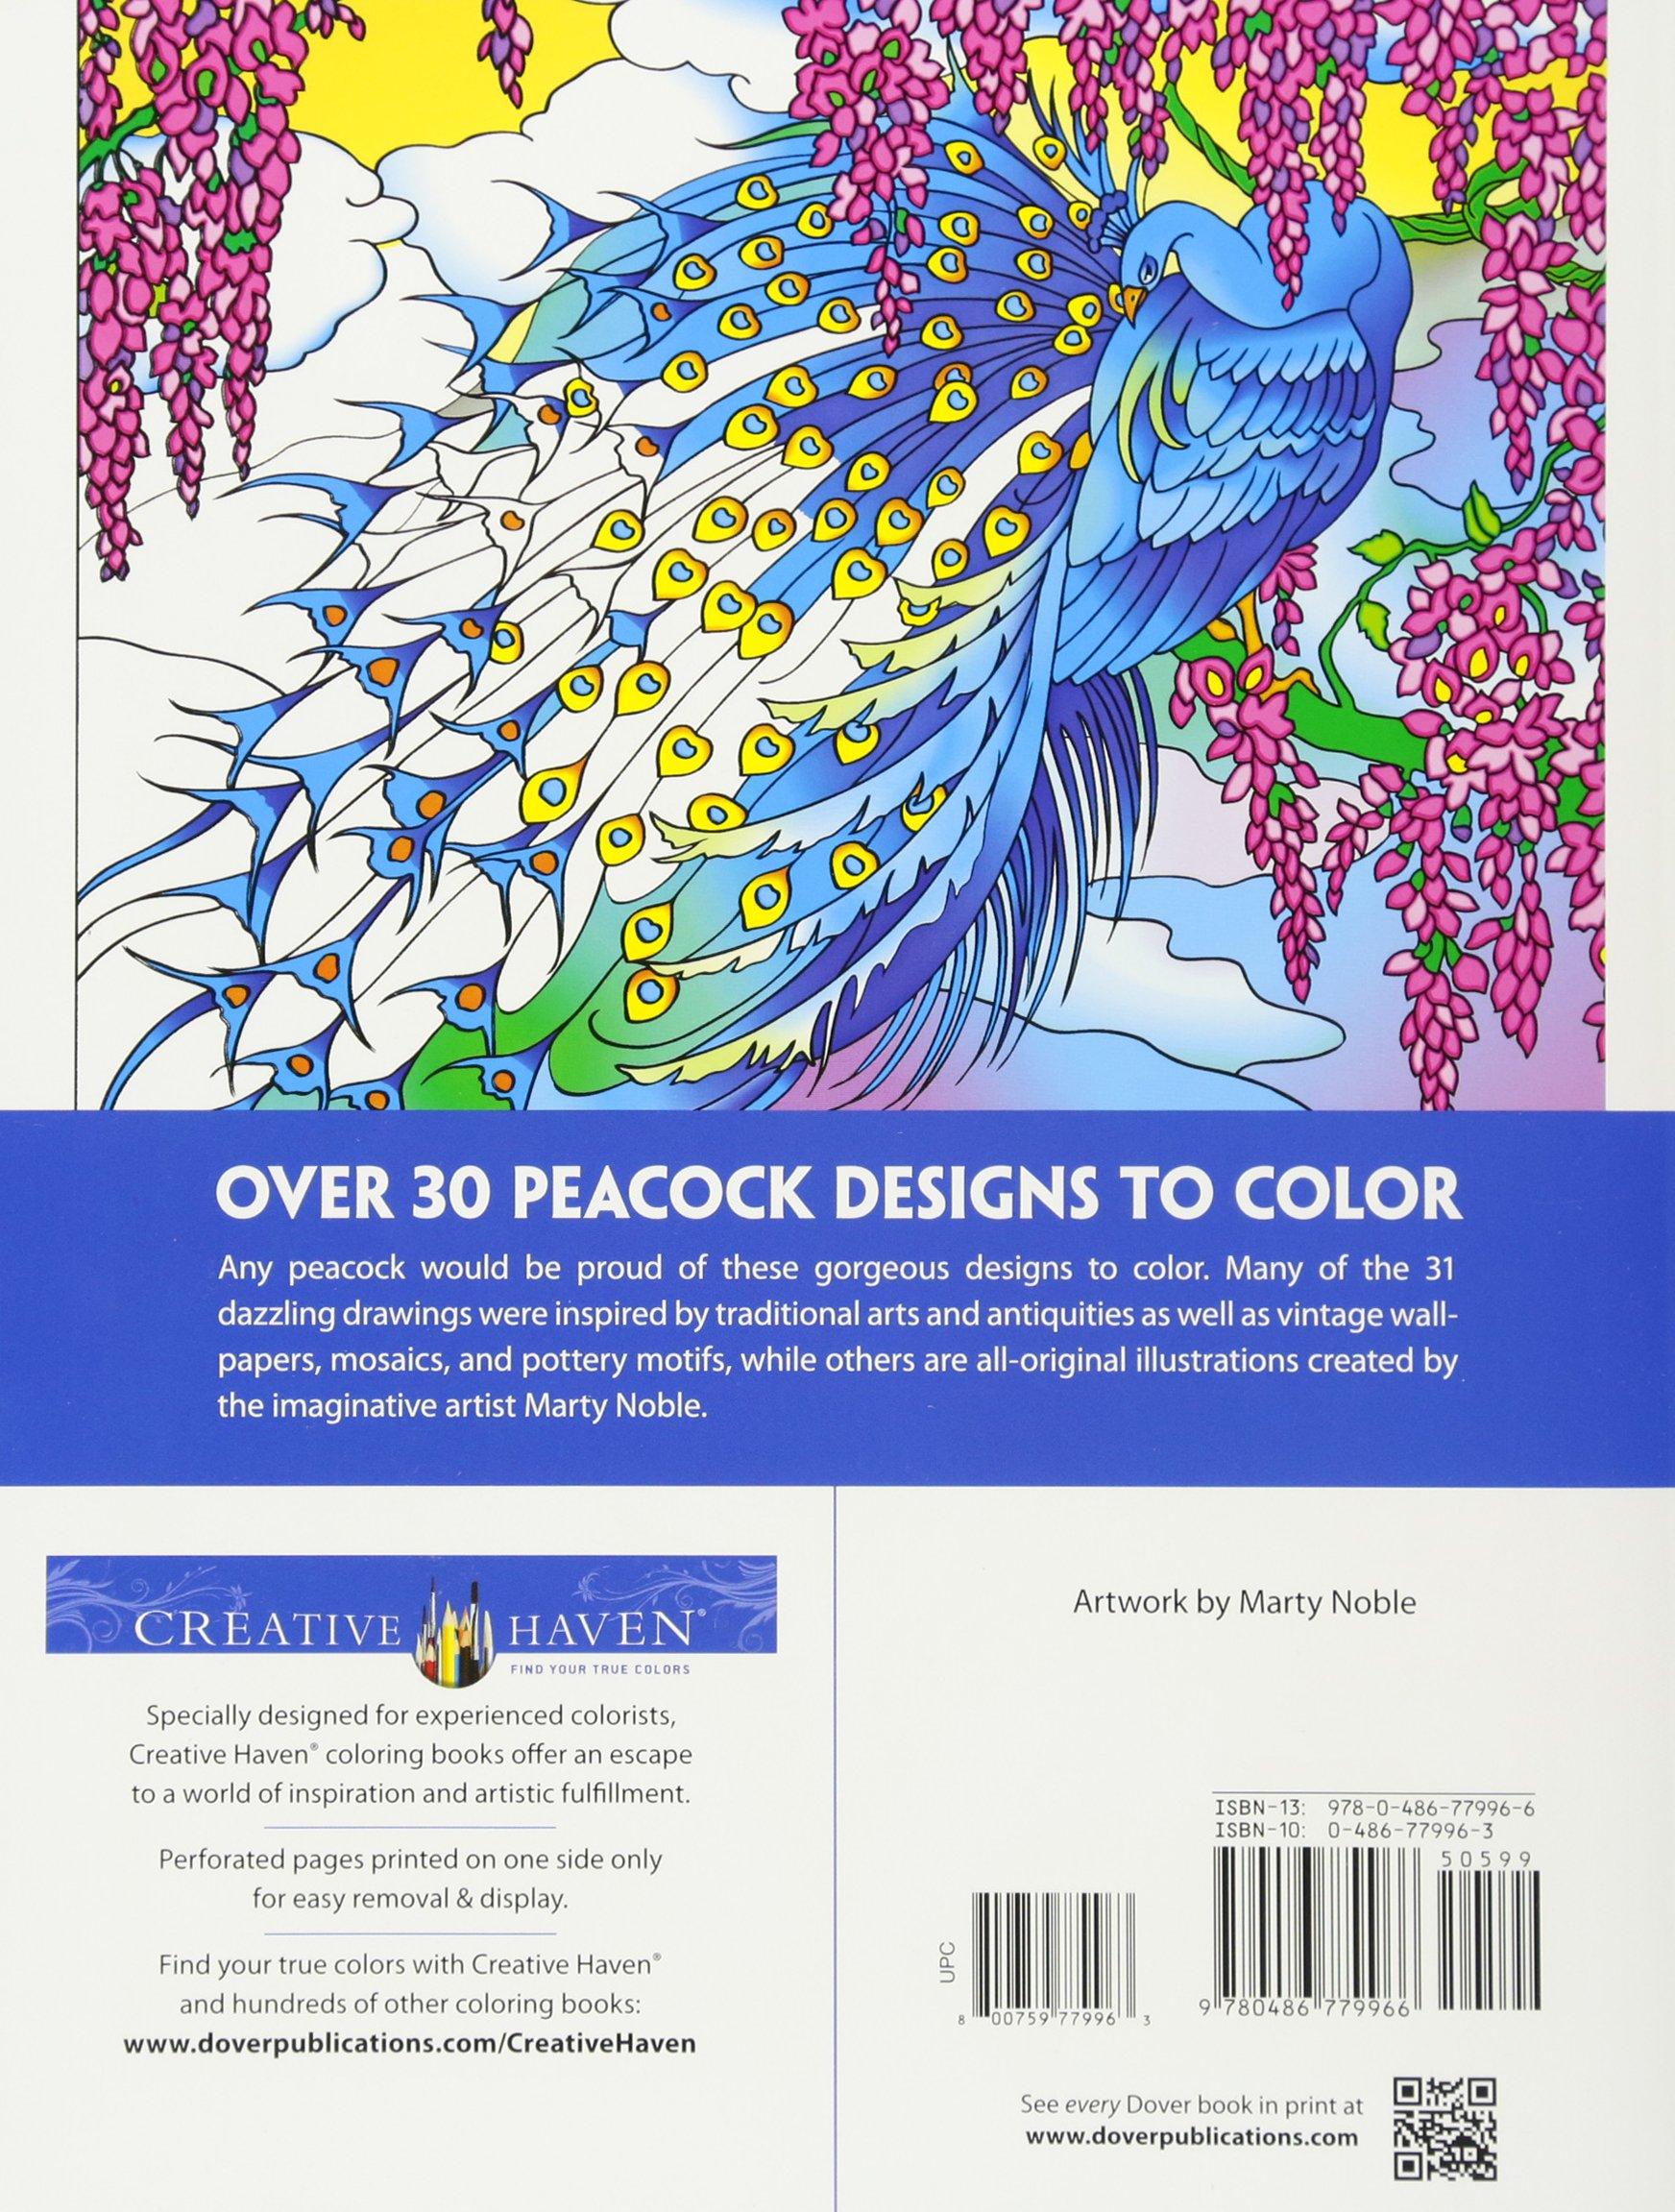 Creative Haven Peacock Designs Coloring Book Books Marty Noble 9780486779966 Amazon